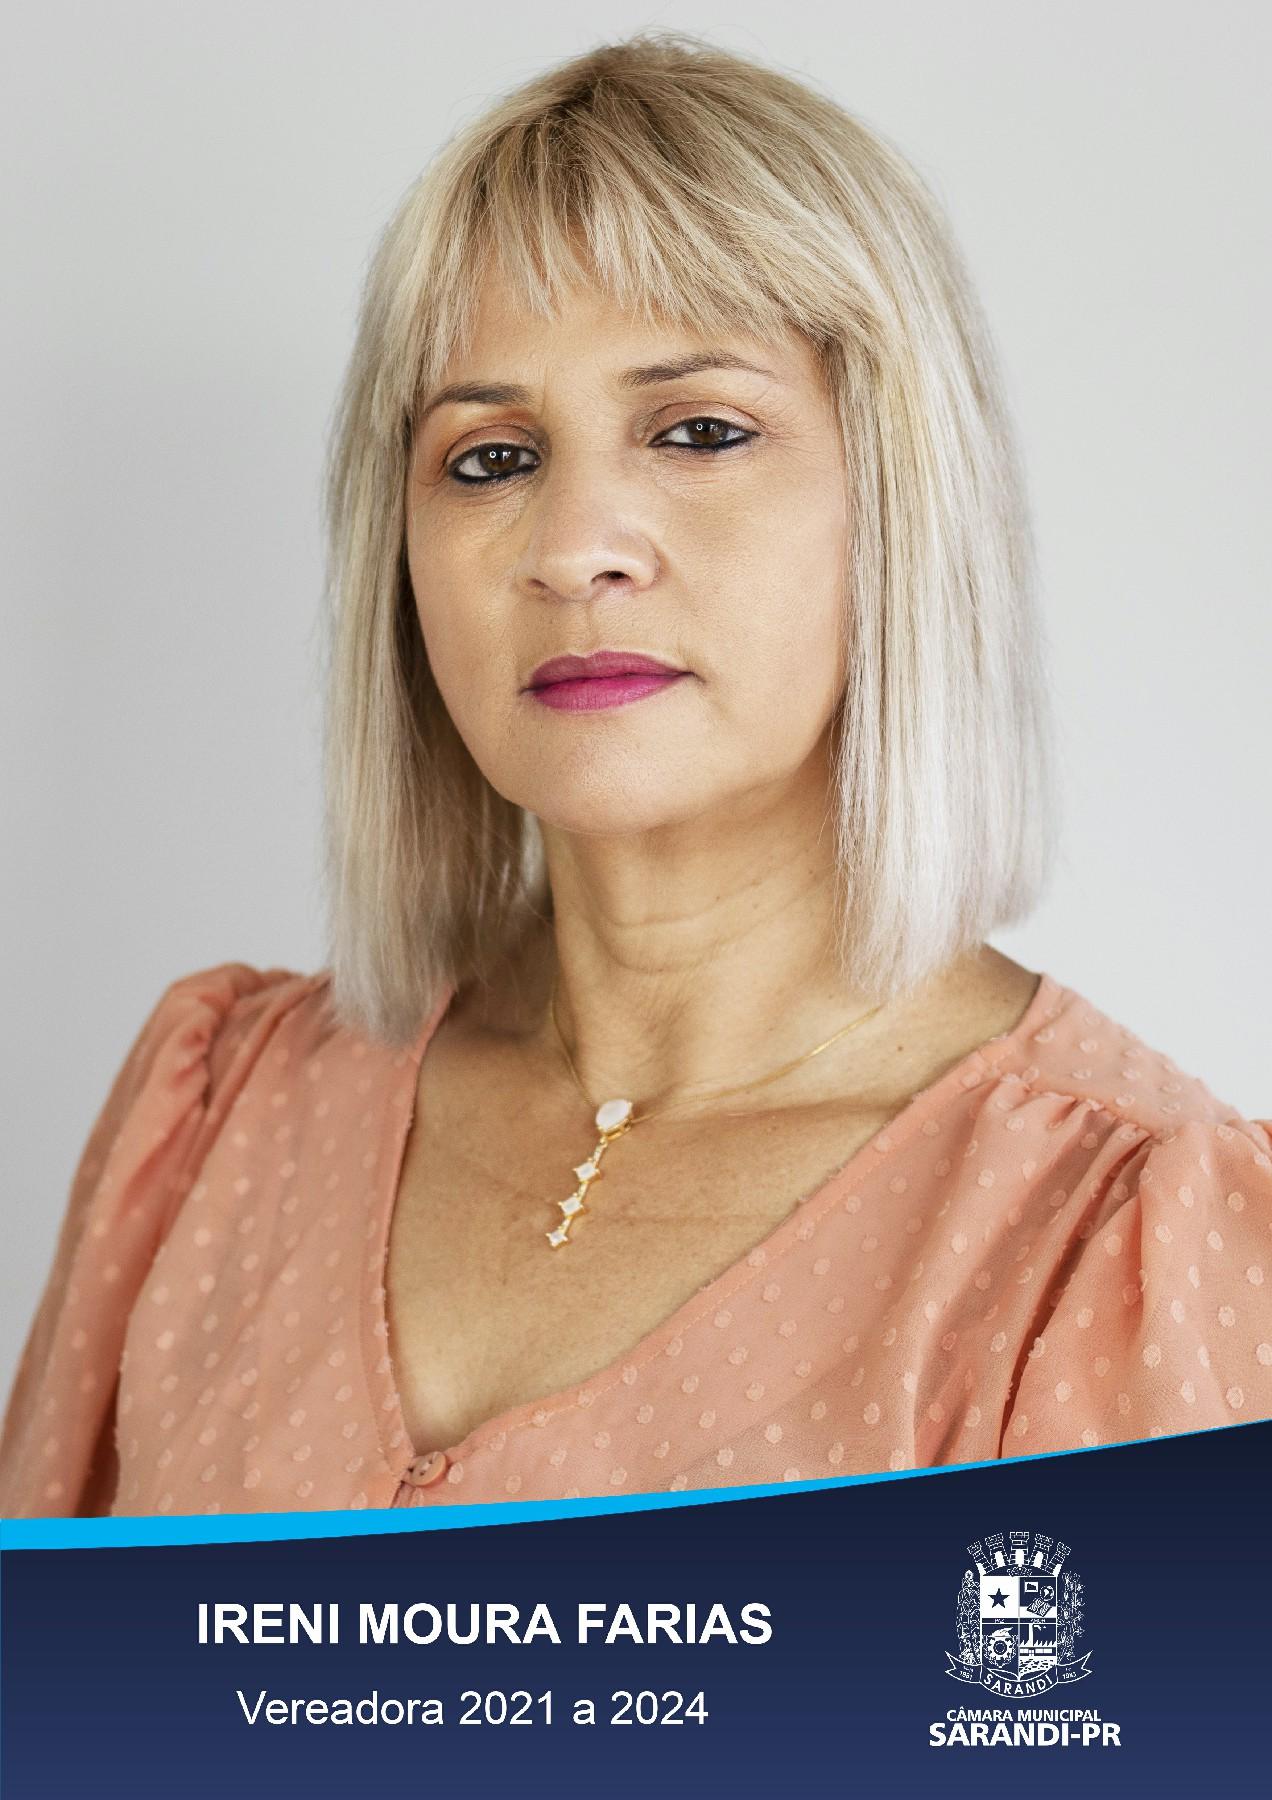 Ireni Moura Farias - Irene Moura